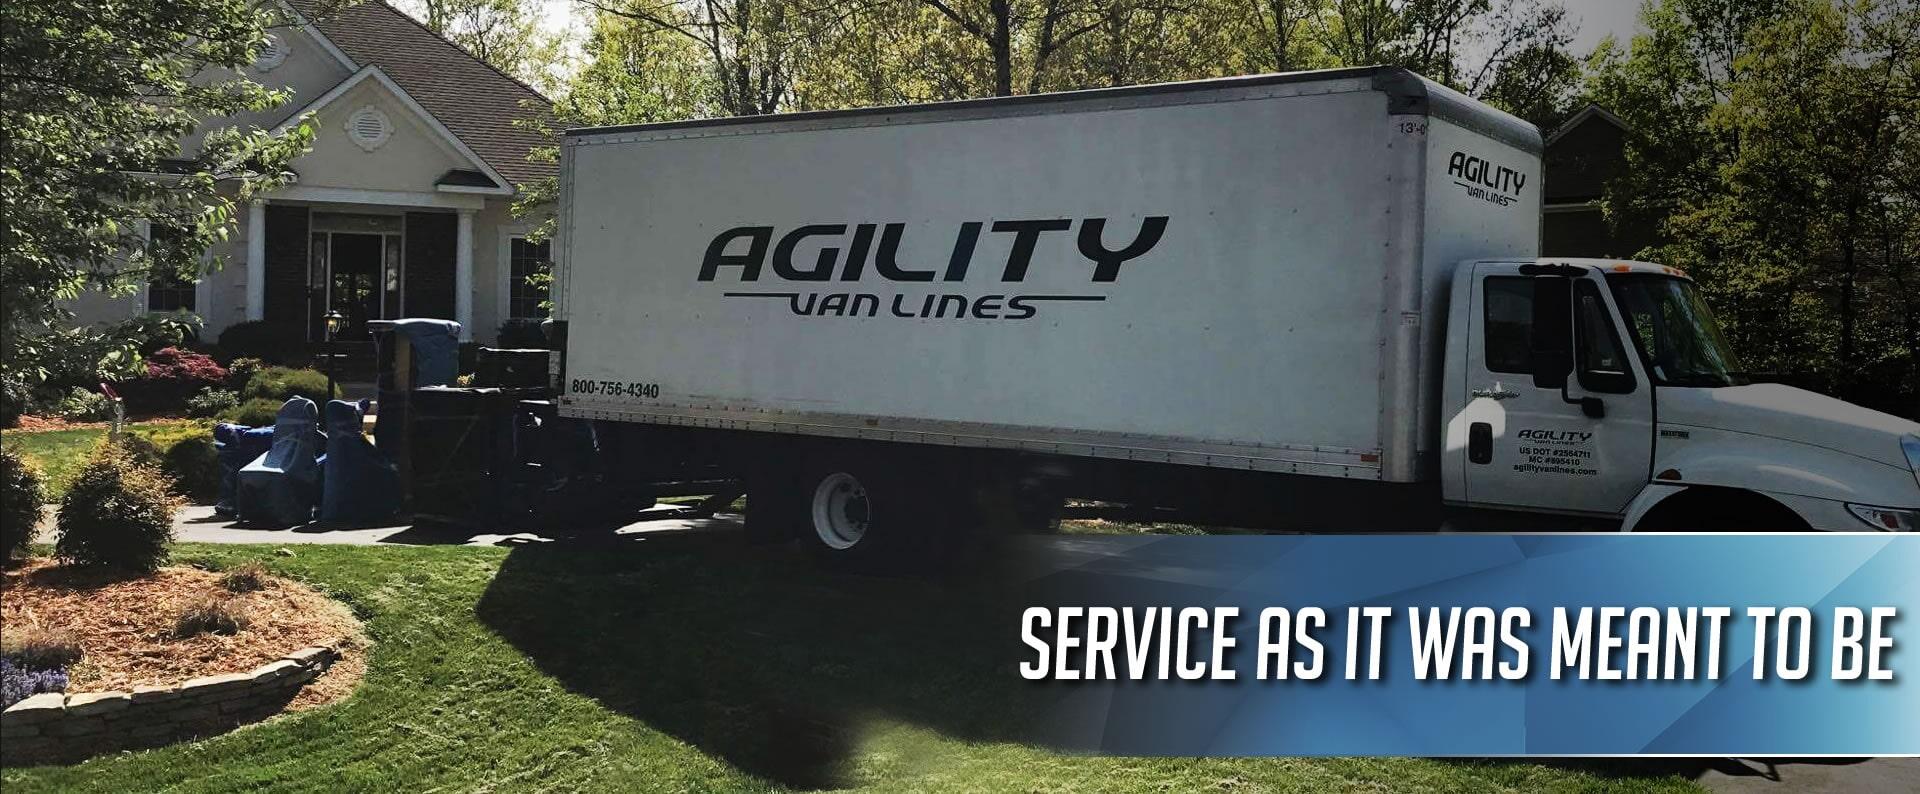 Agility Van Lines, Inc. image 3